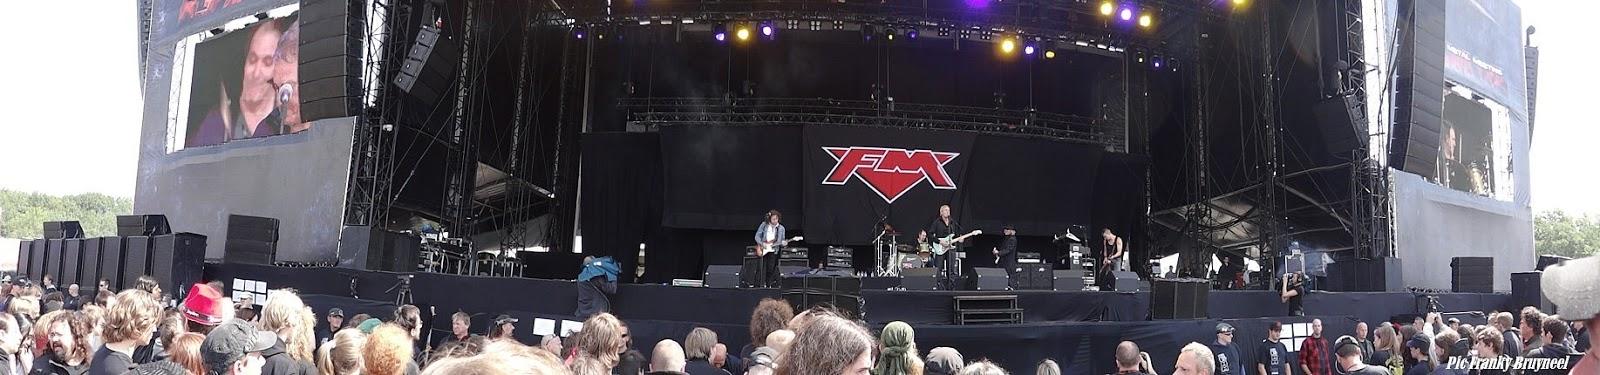 FM live at Graspop 24 June 2011. Photo courtesy of Franky Bruyneel at Rock Report